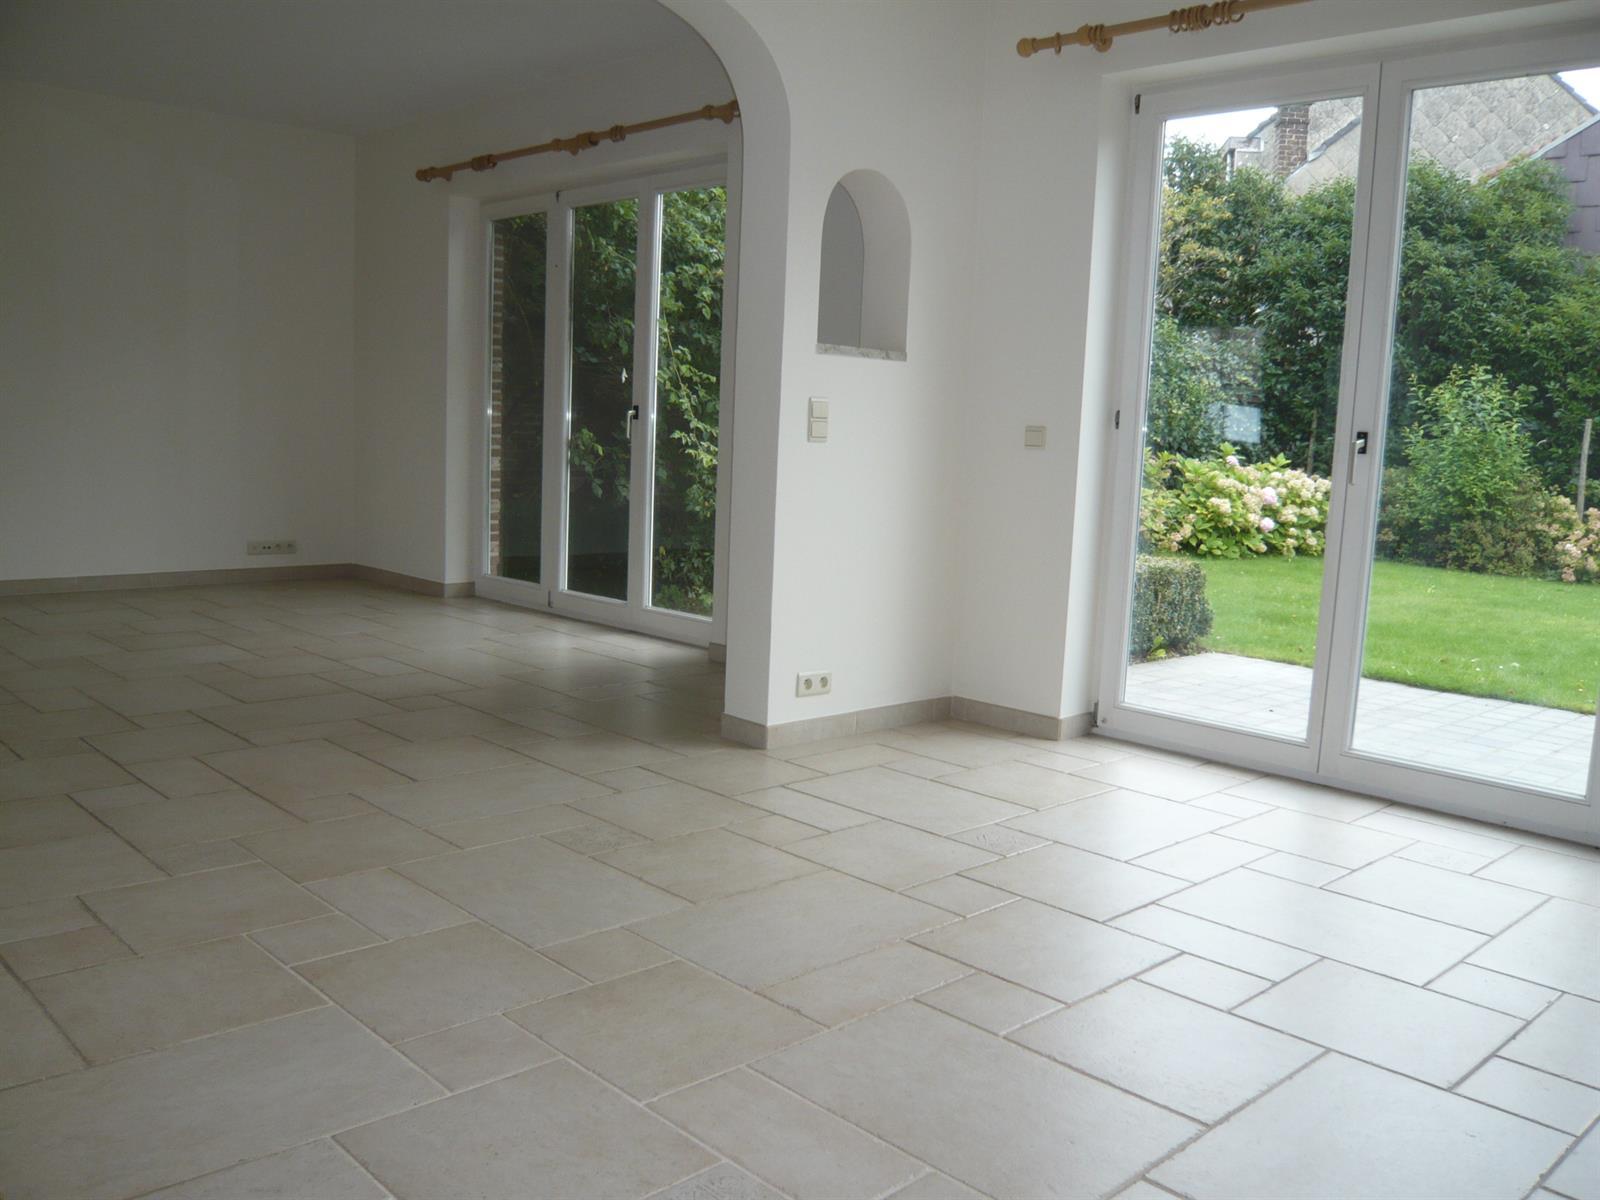 Villa - Braine-l'Alleud - #3981723-26